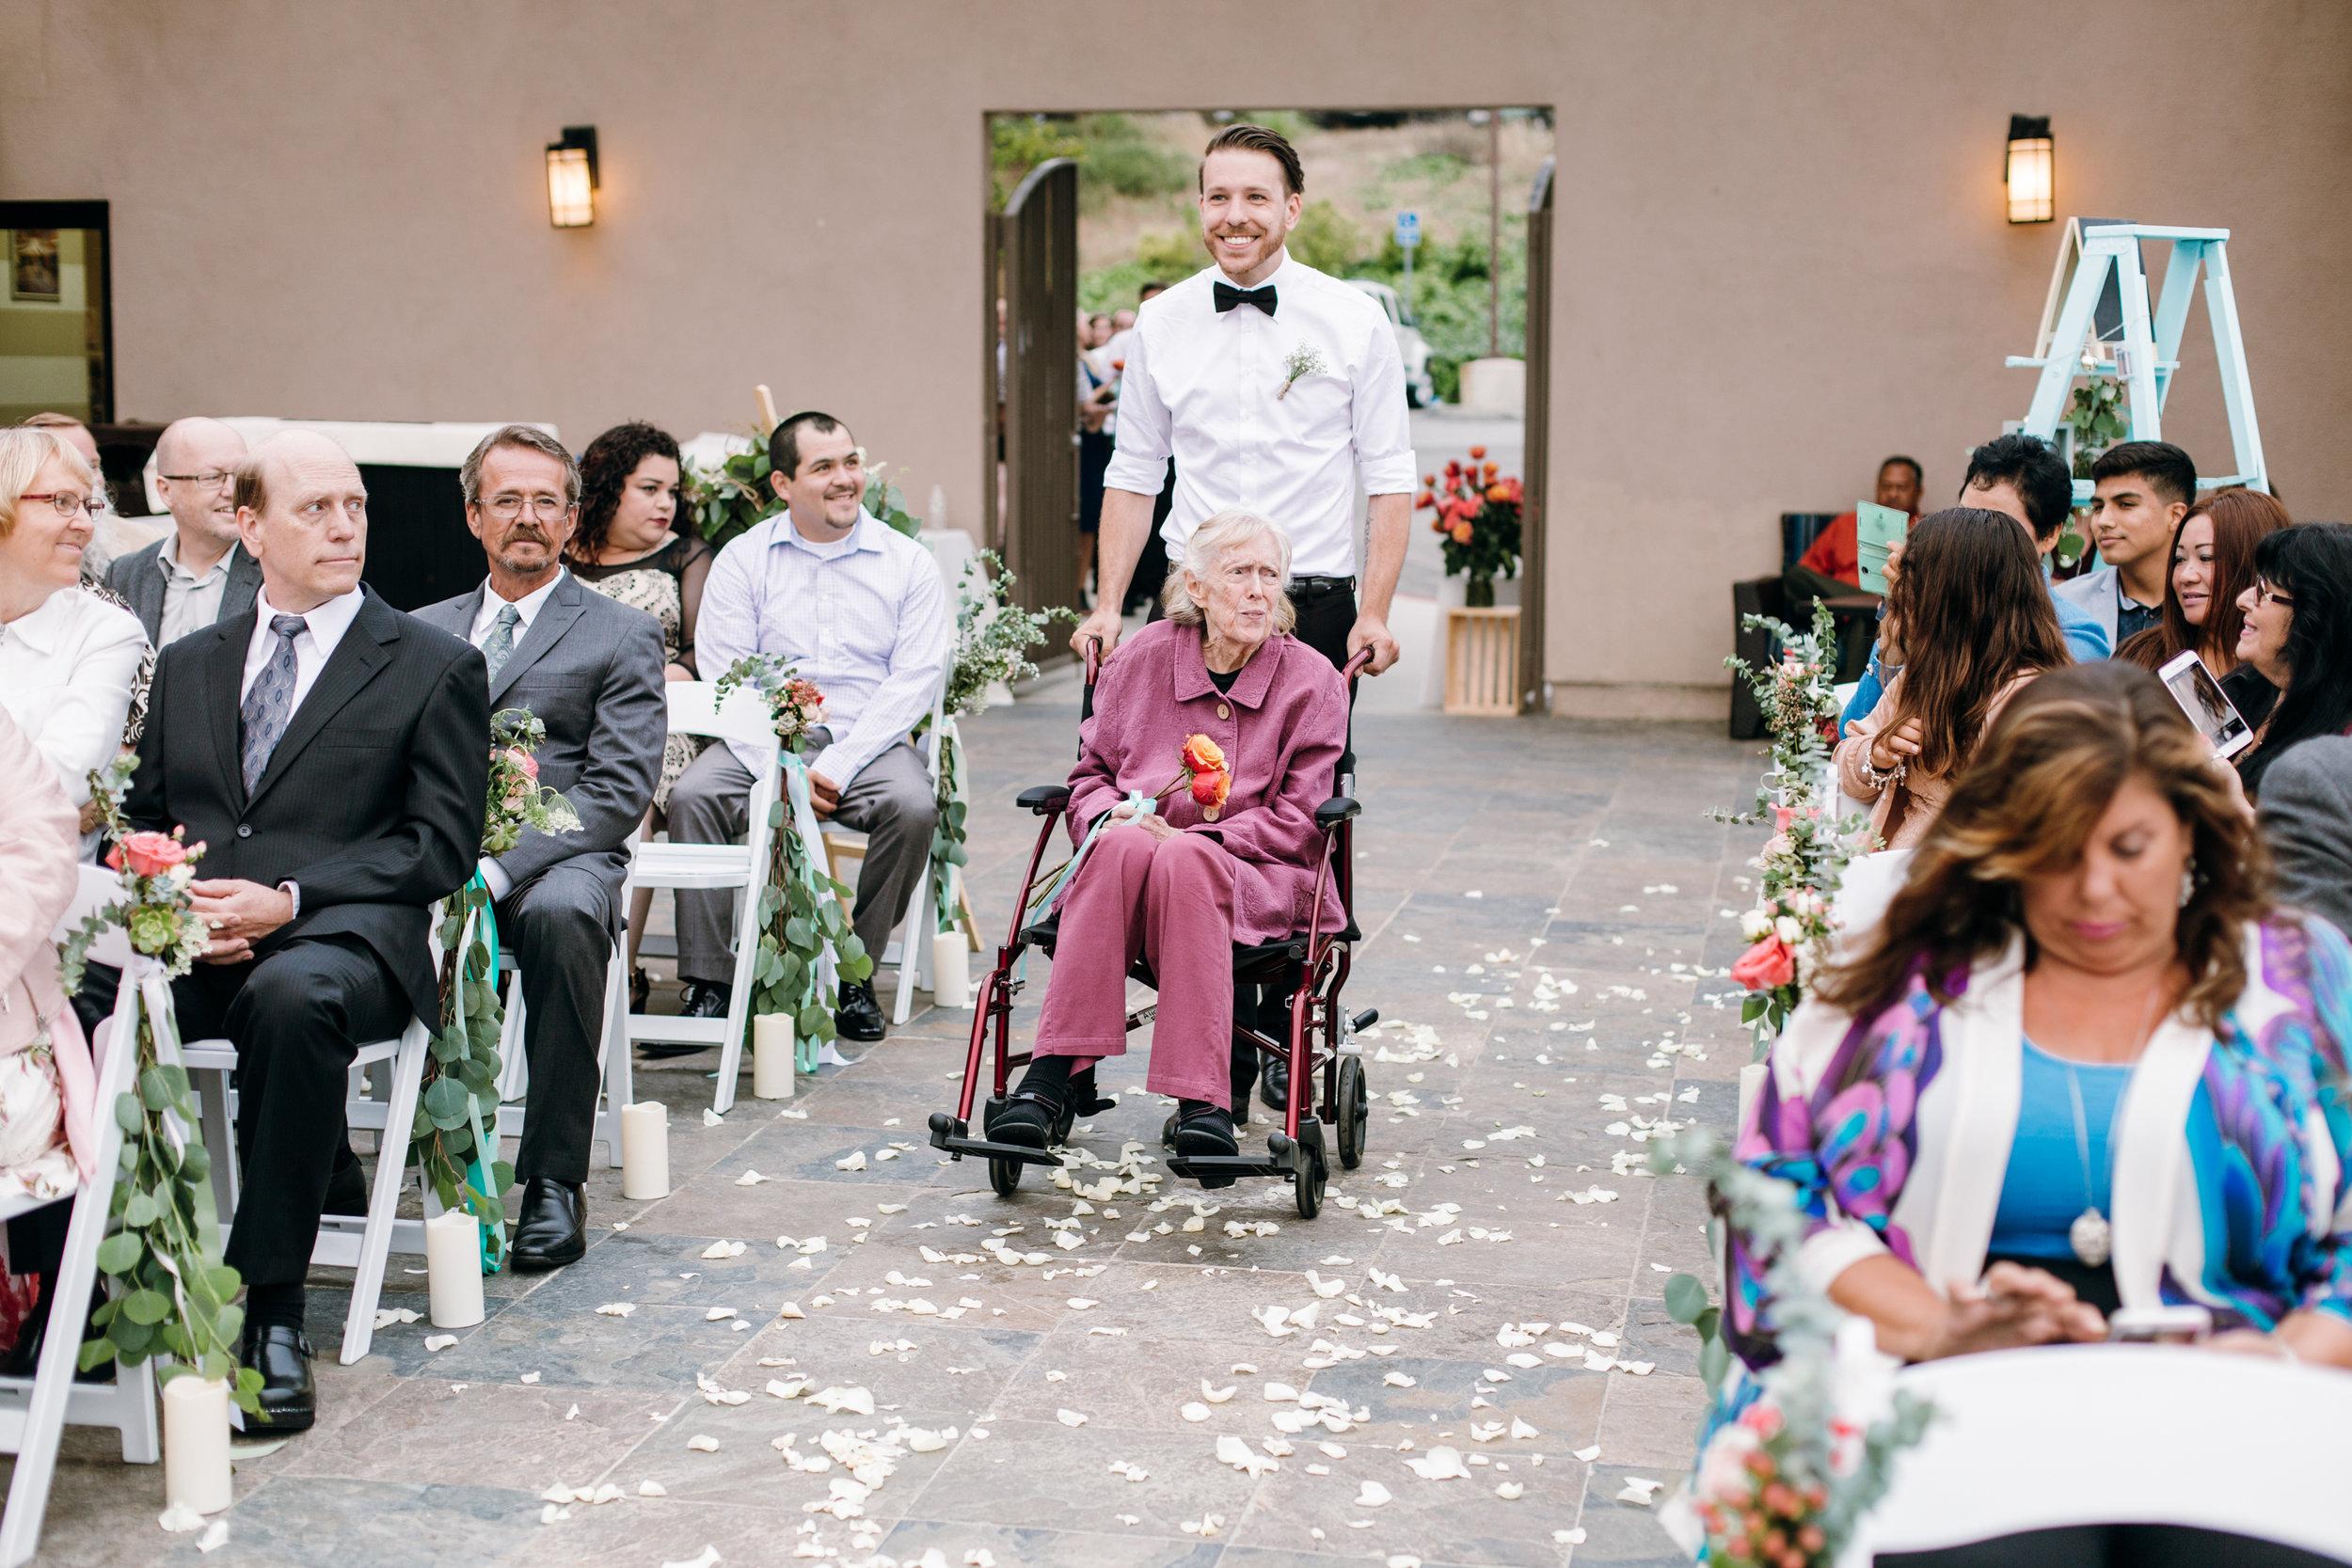 KaraNixonWeddings-PalosVerdes-Wedding-22.jpg